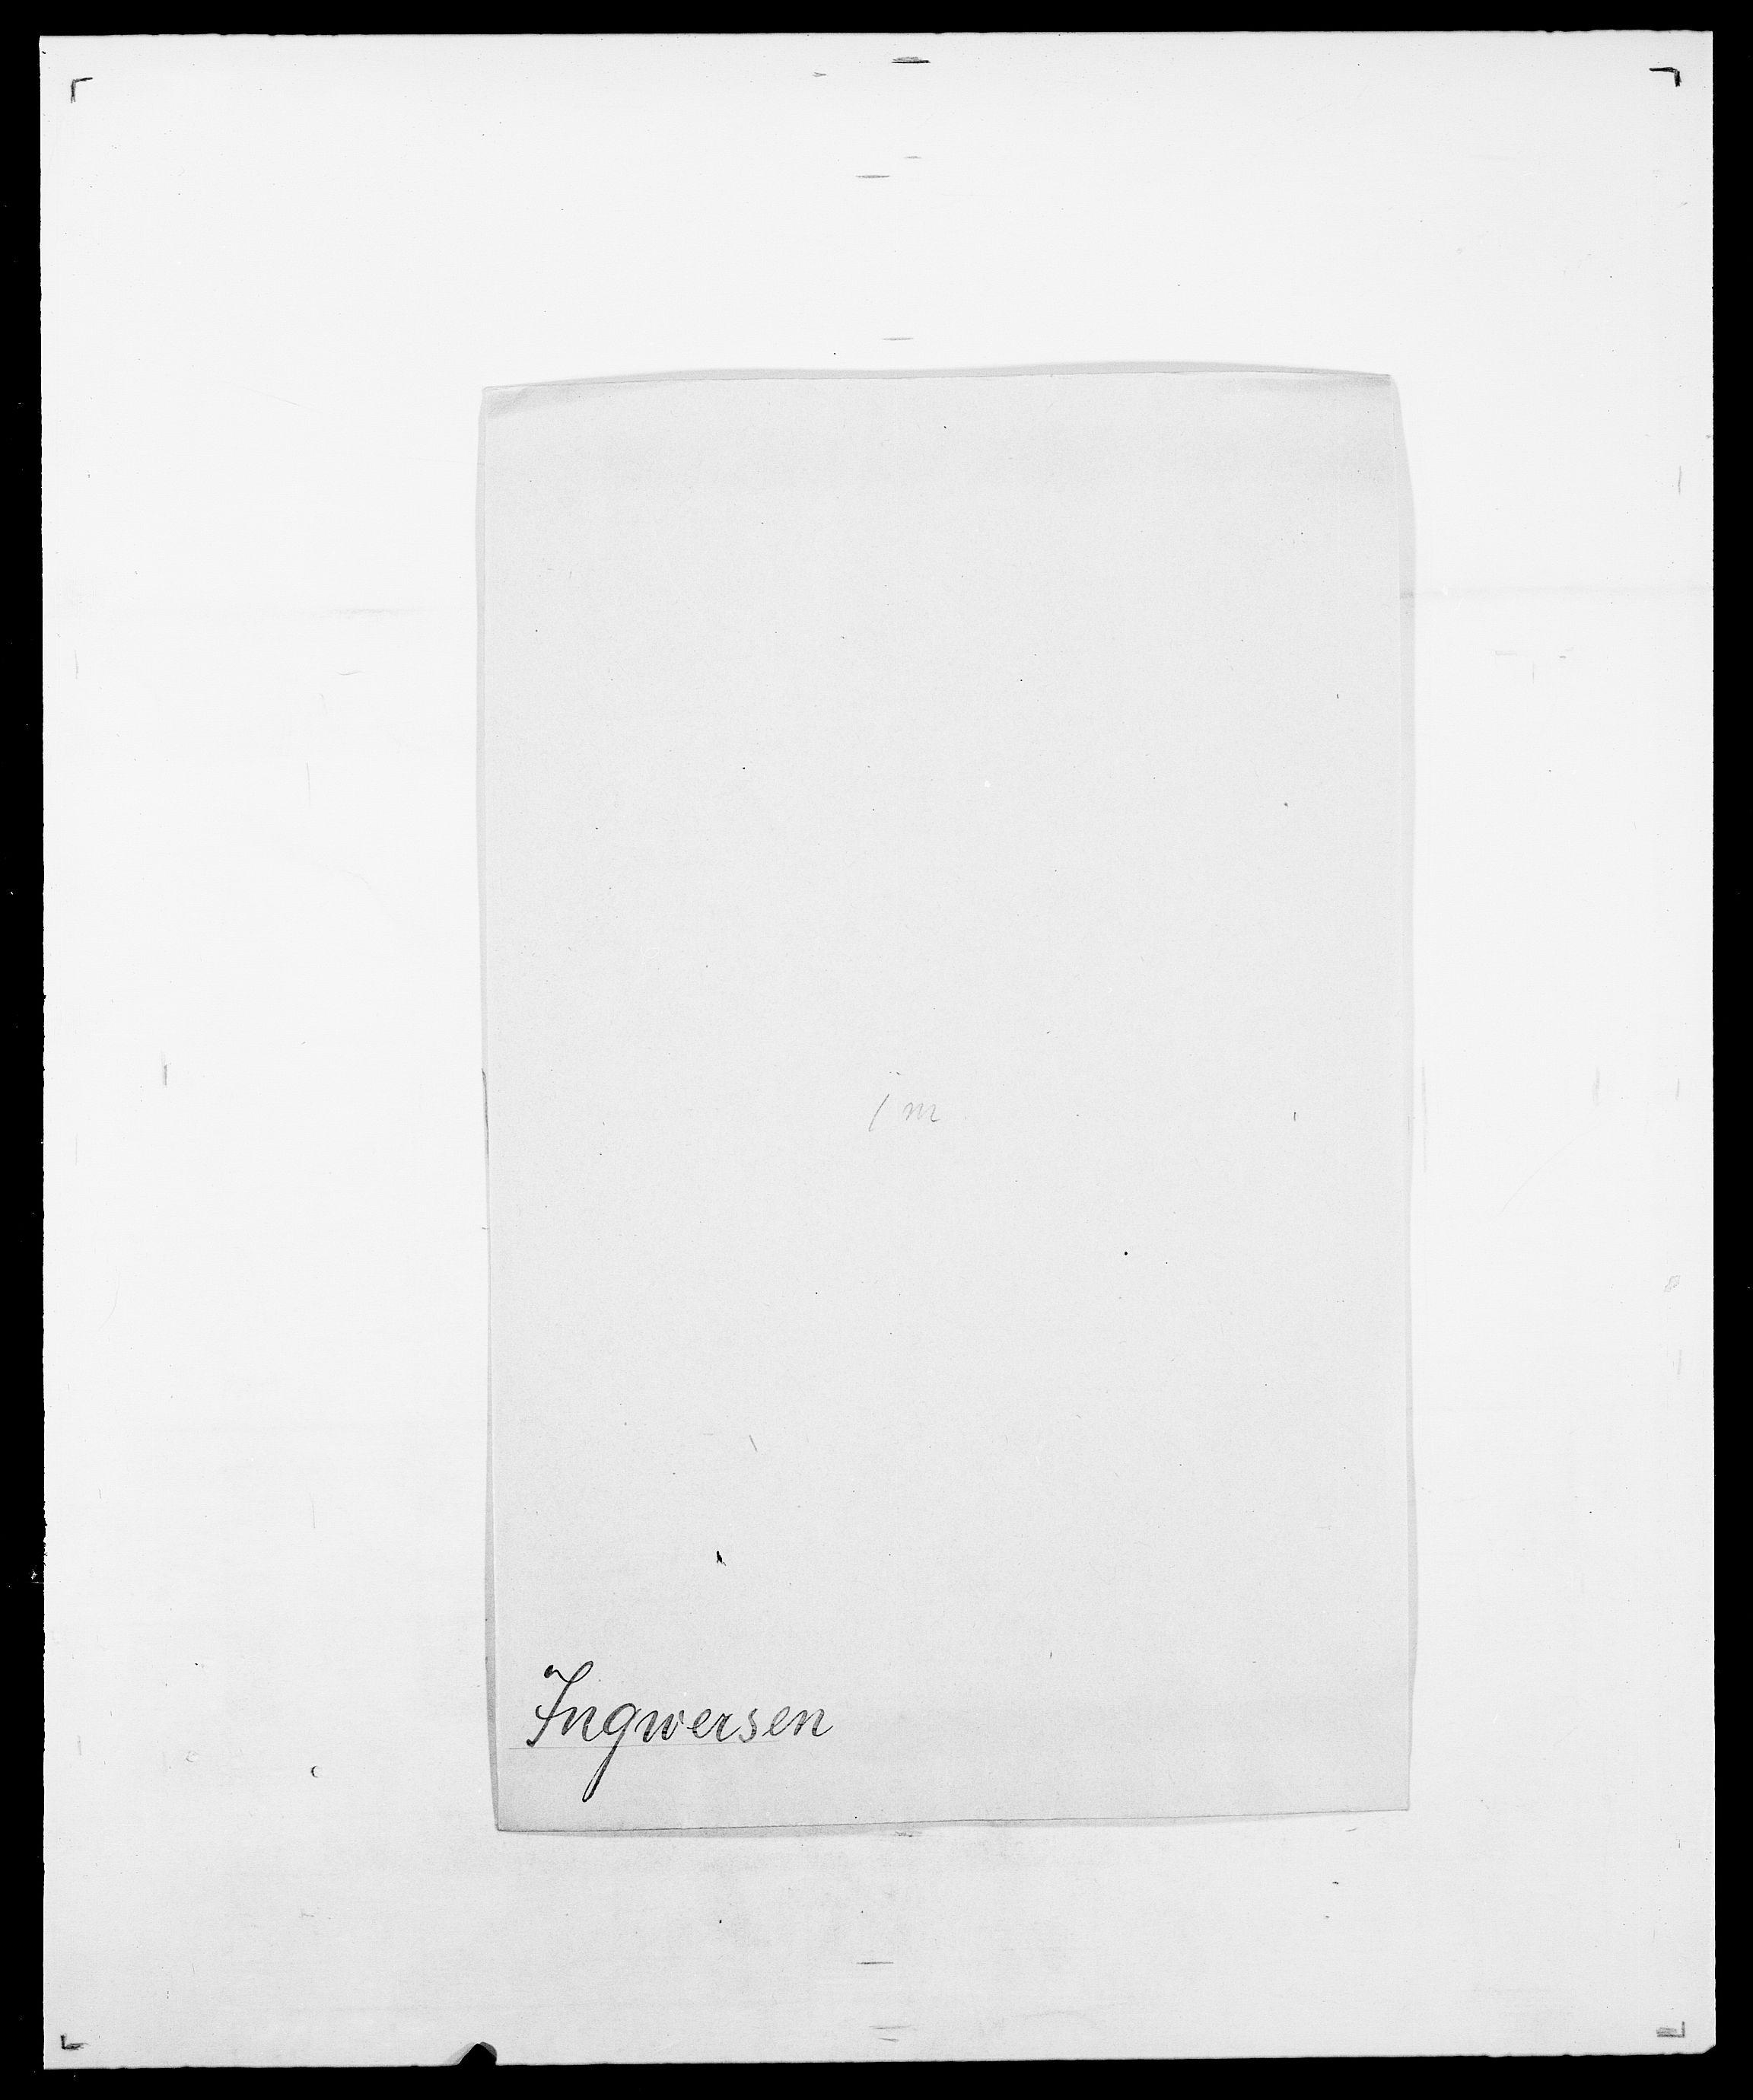 SAO, Delgobe, Charles Antoine - samling, D/Da/L0019: van der Hude - Joys, s. 804